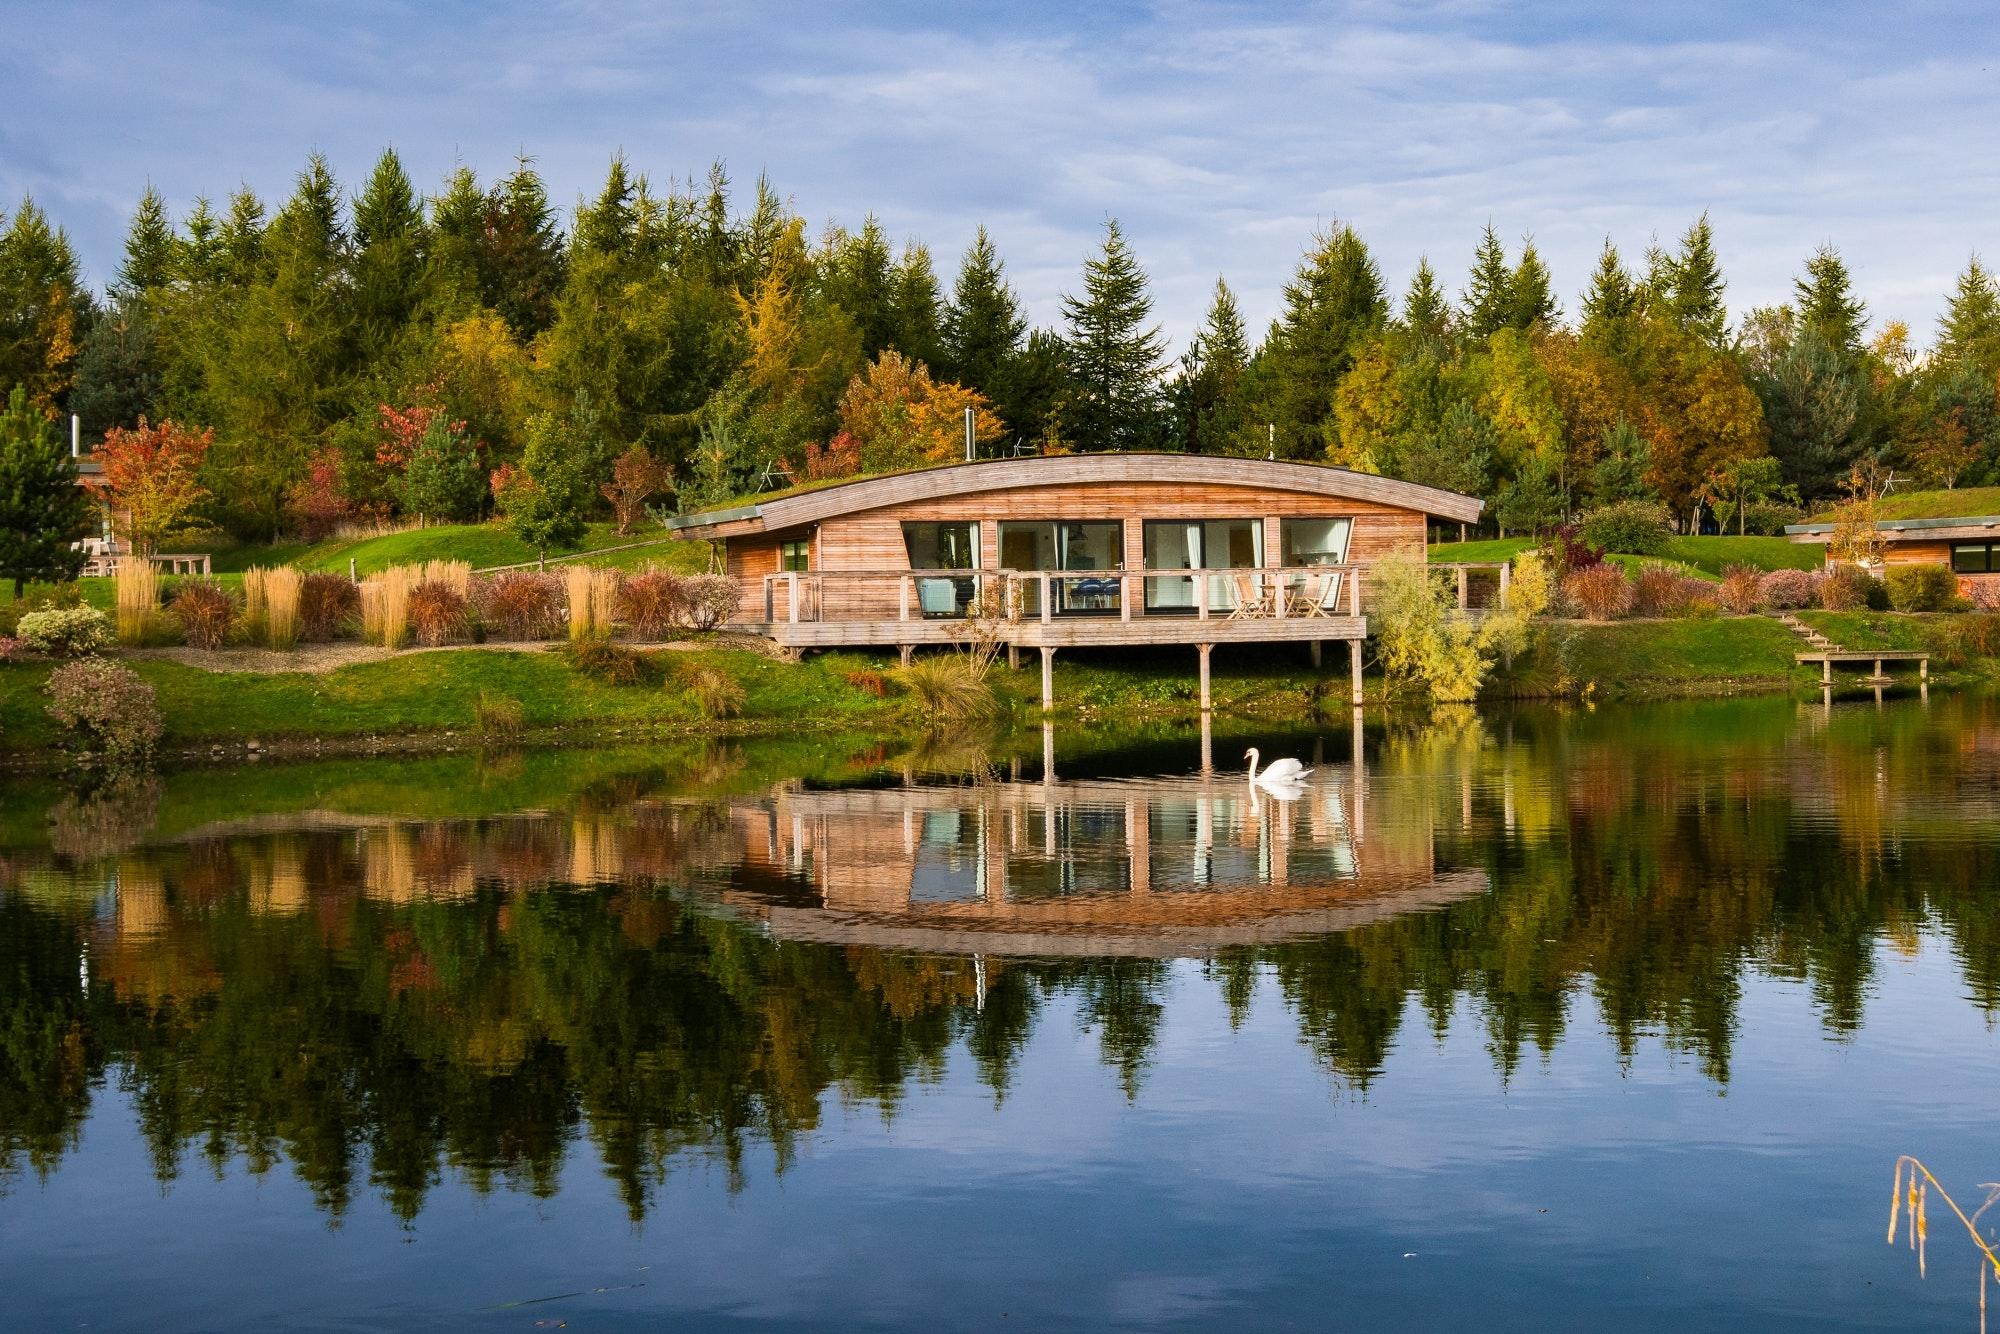 Designer Bathrooms Gallery Brompton Lakes Lodges A Stunning Yorkshire Lakeside Getaway